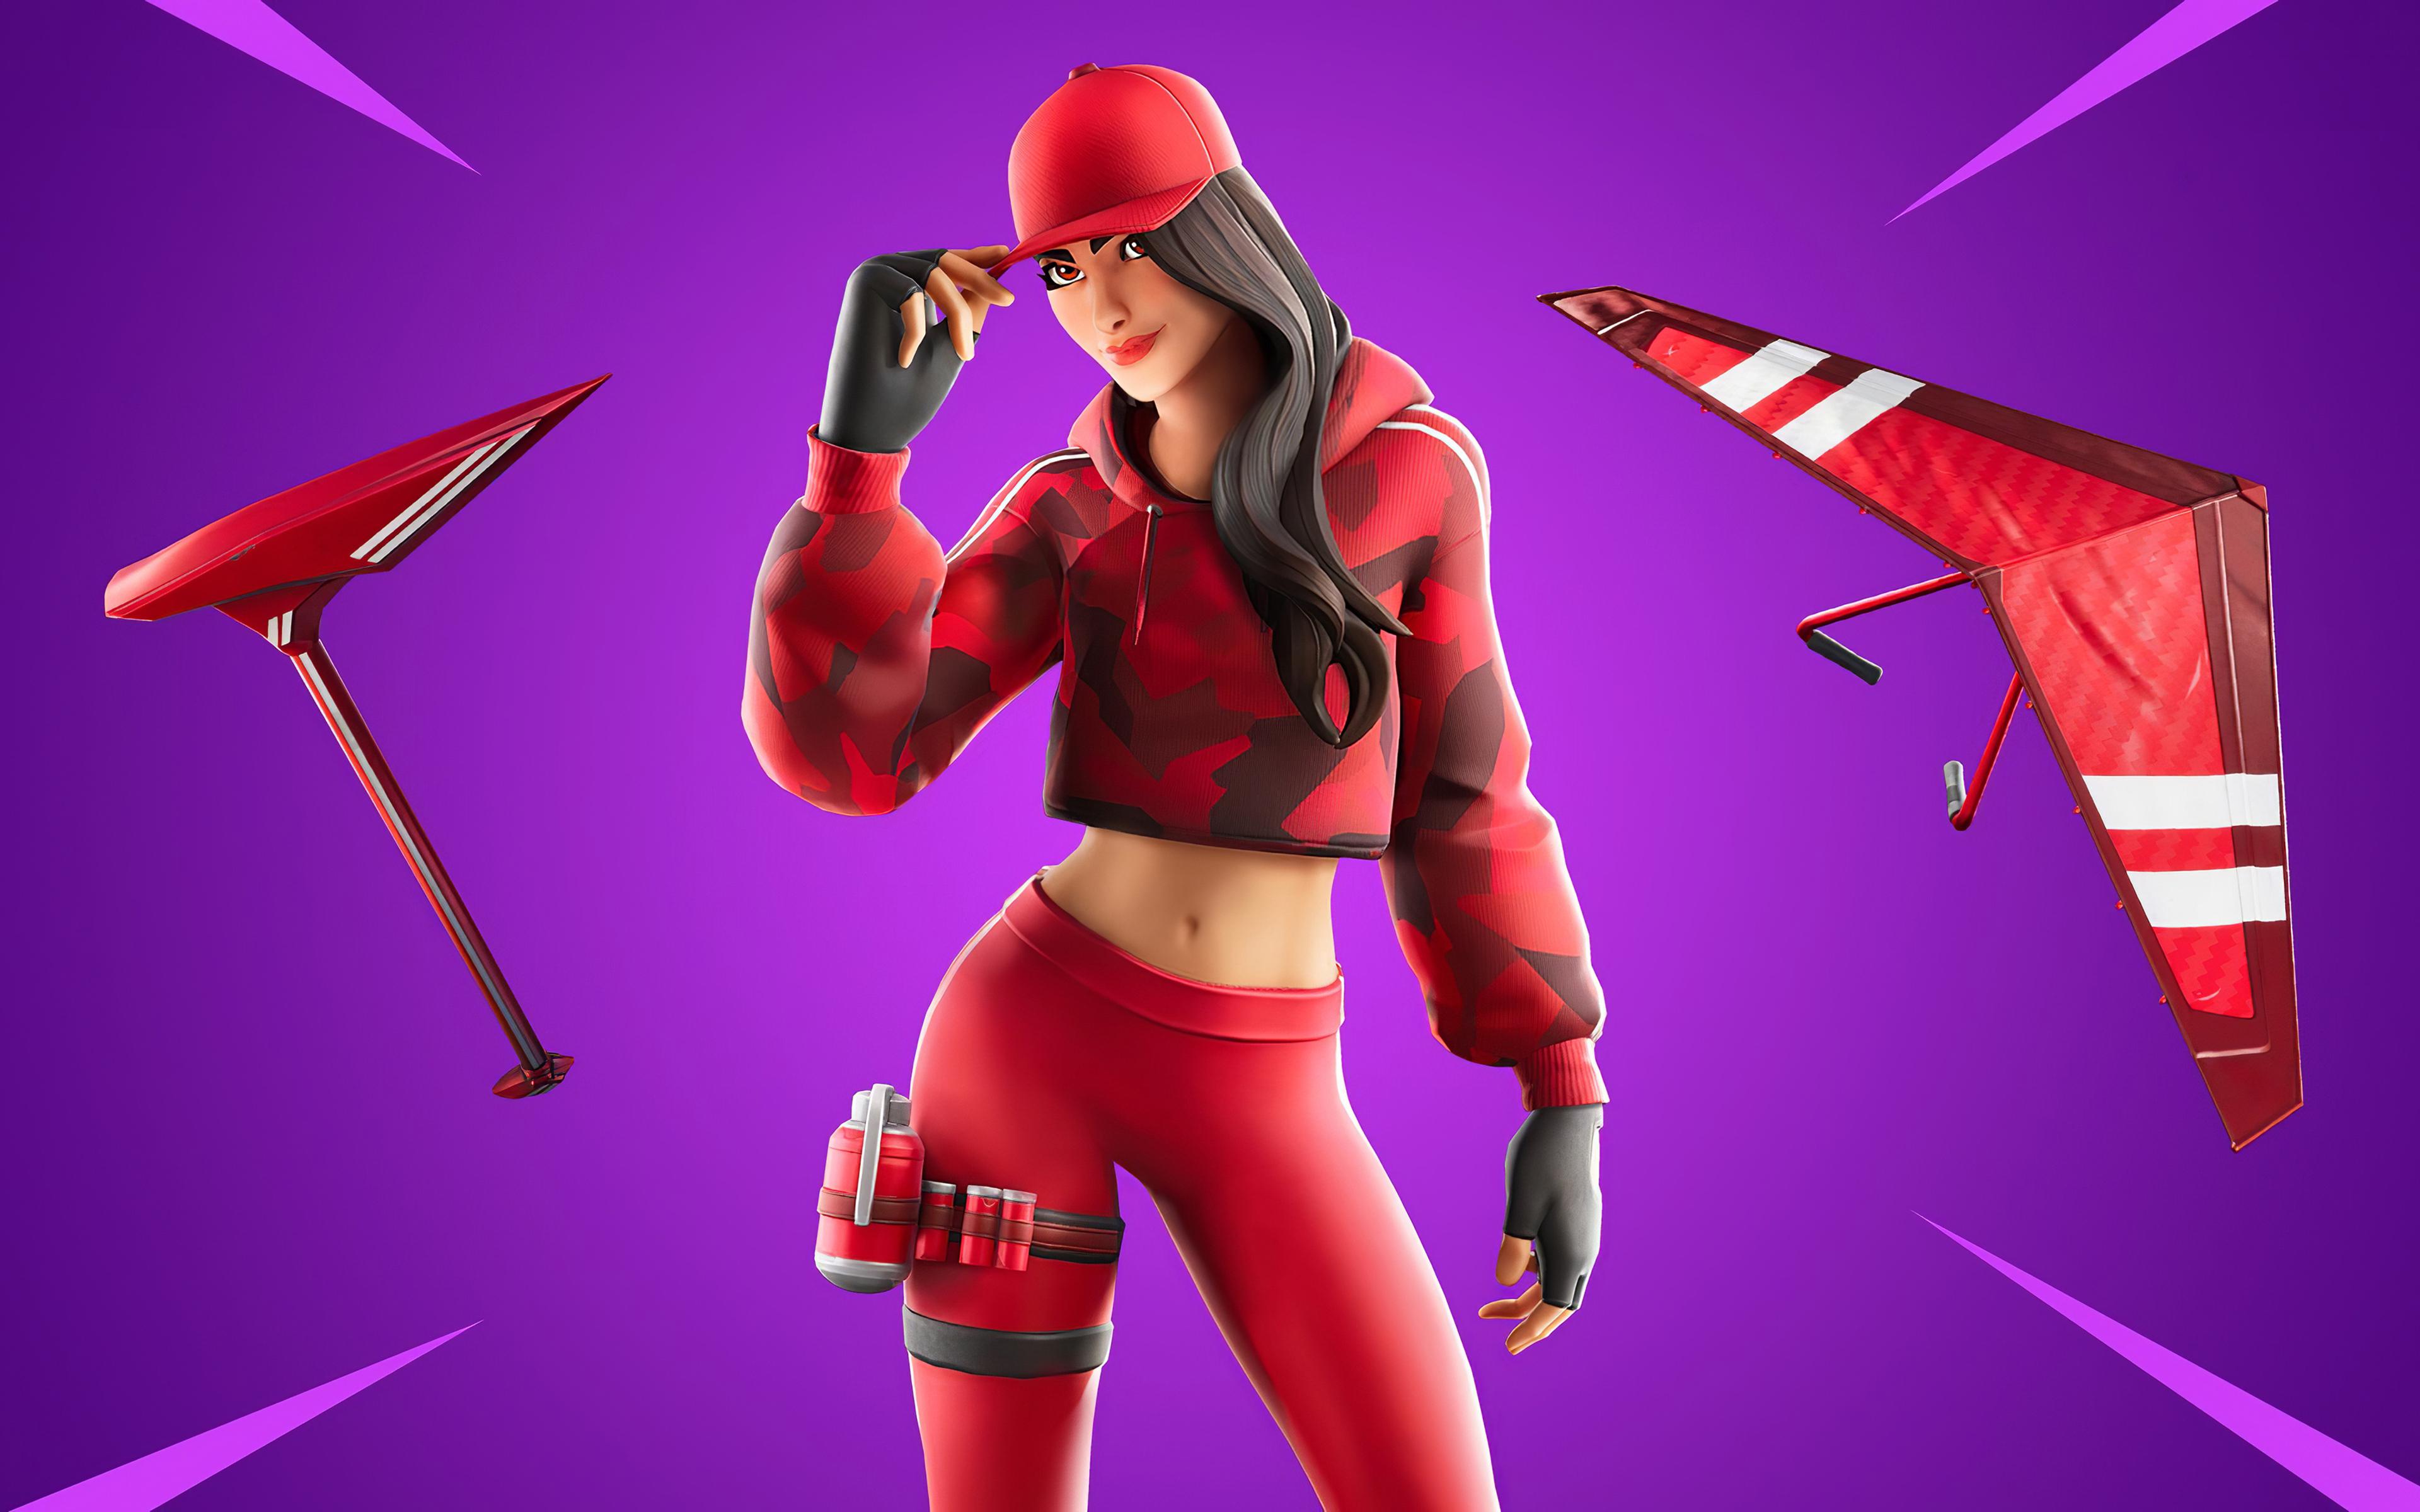 fortnite-chapter-2-ruby-outfit-4k-n3.jpg